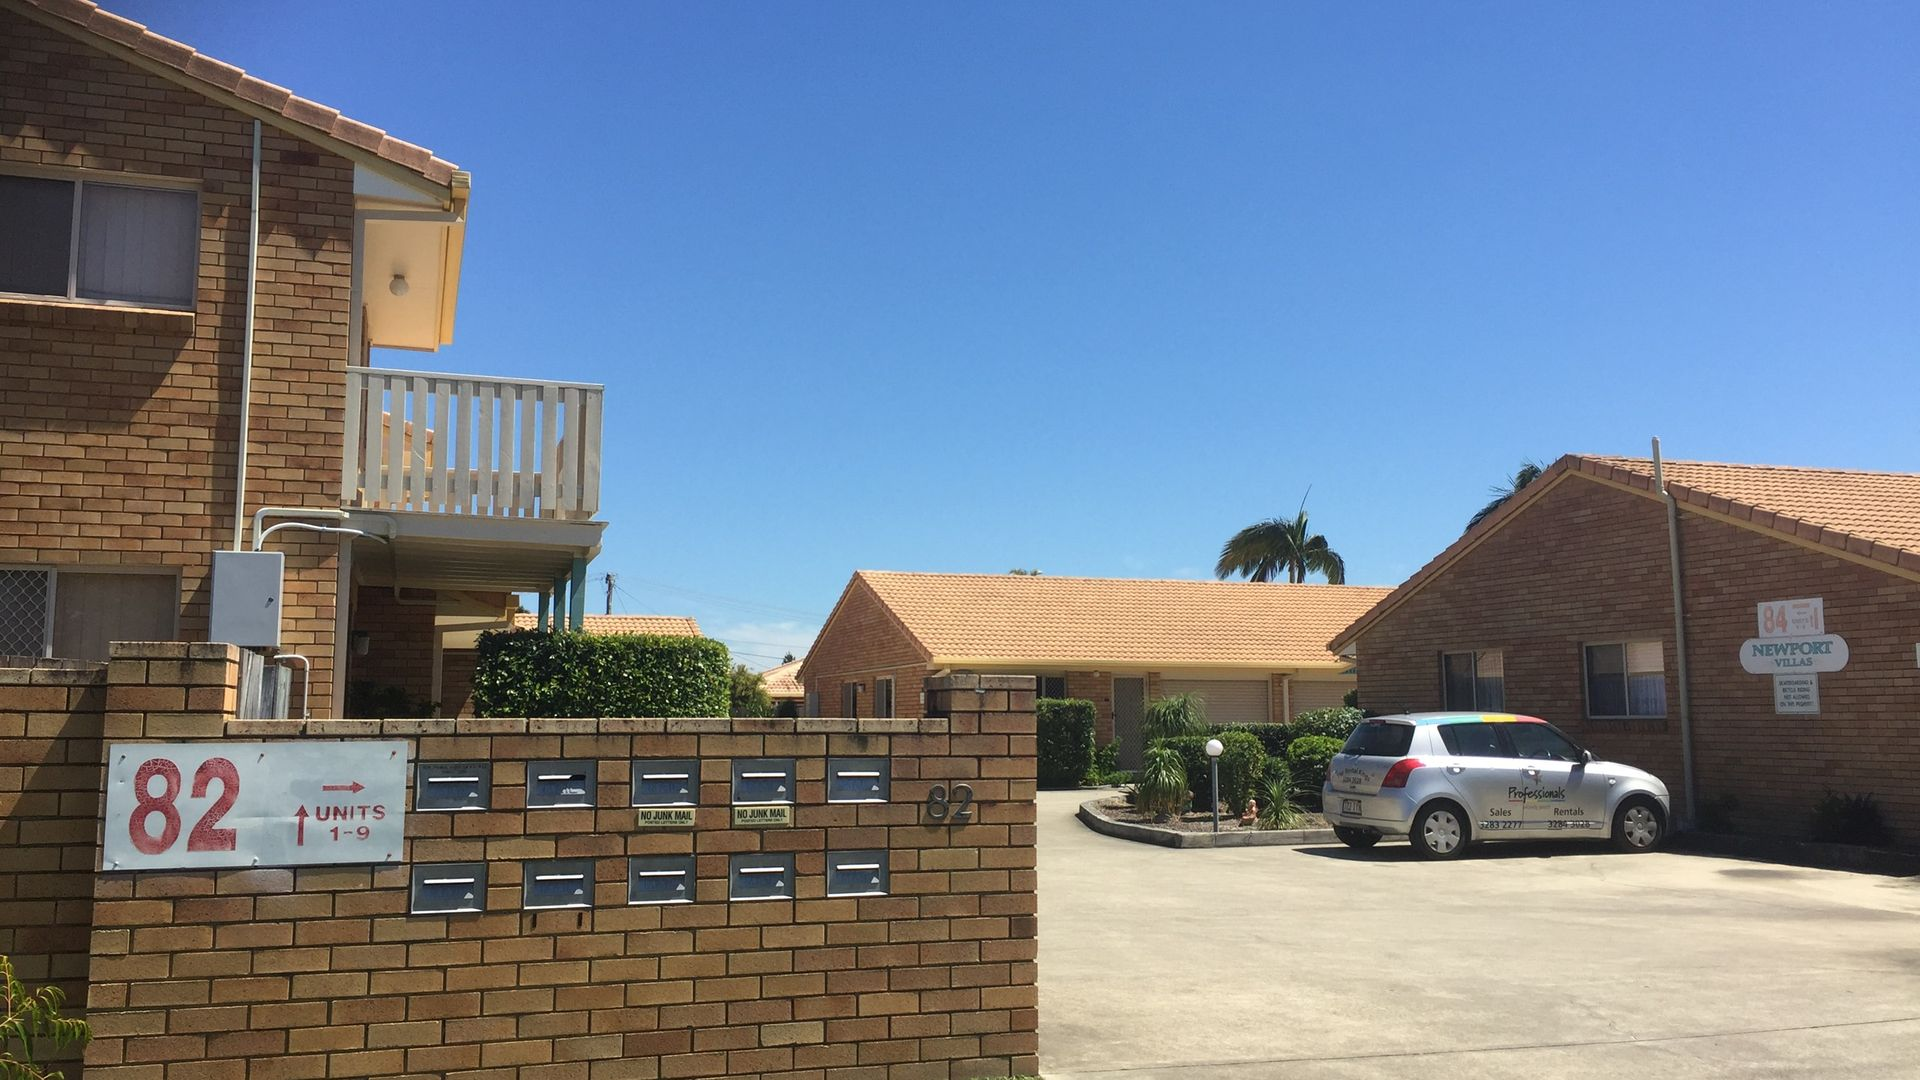 6/82 Ashmole Road, Redcliffe QLD 4020, Image 7